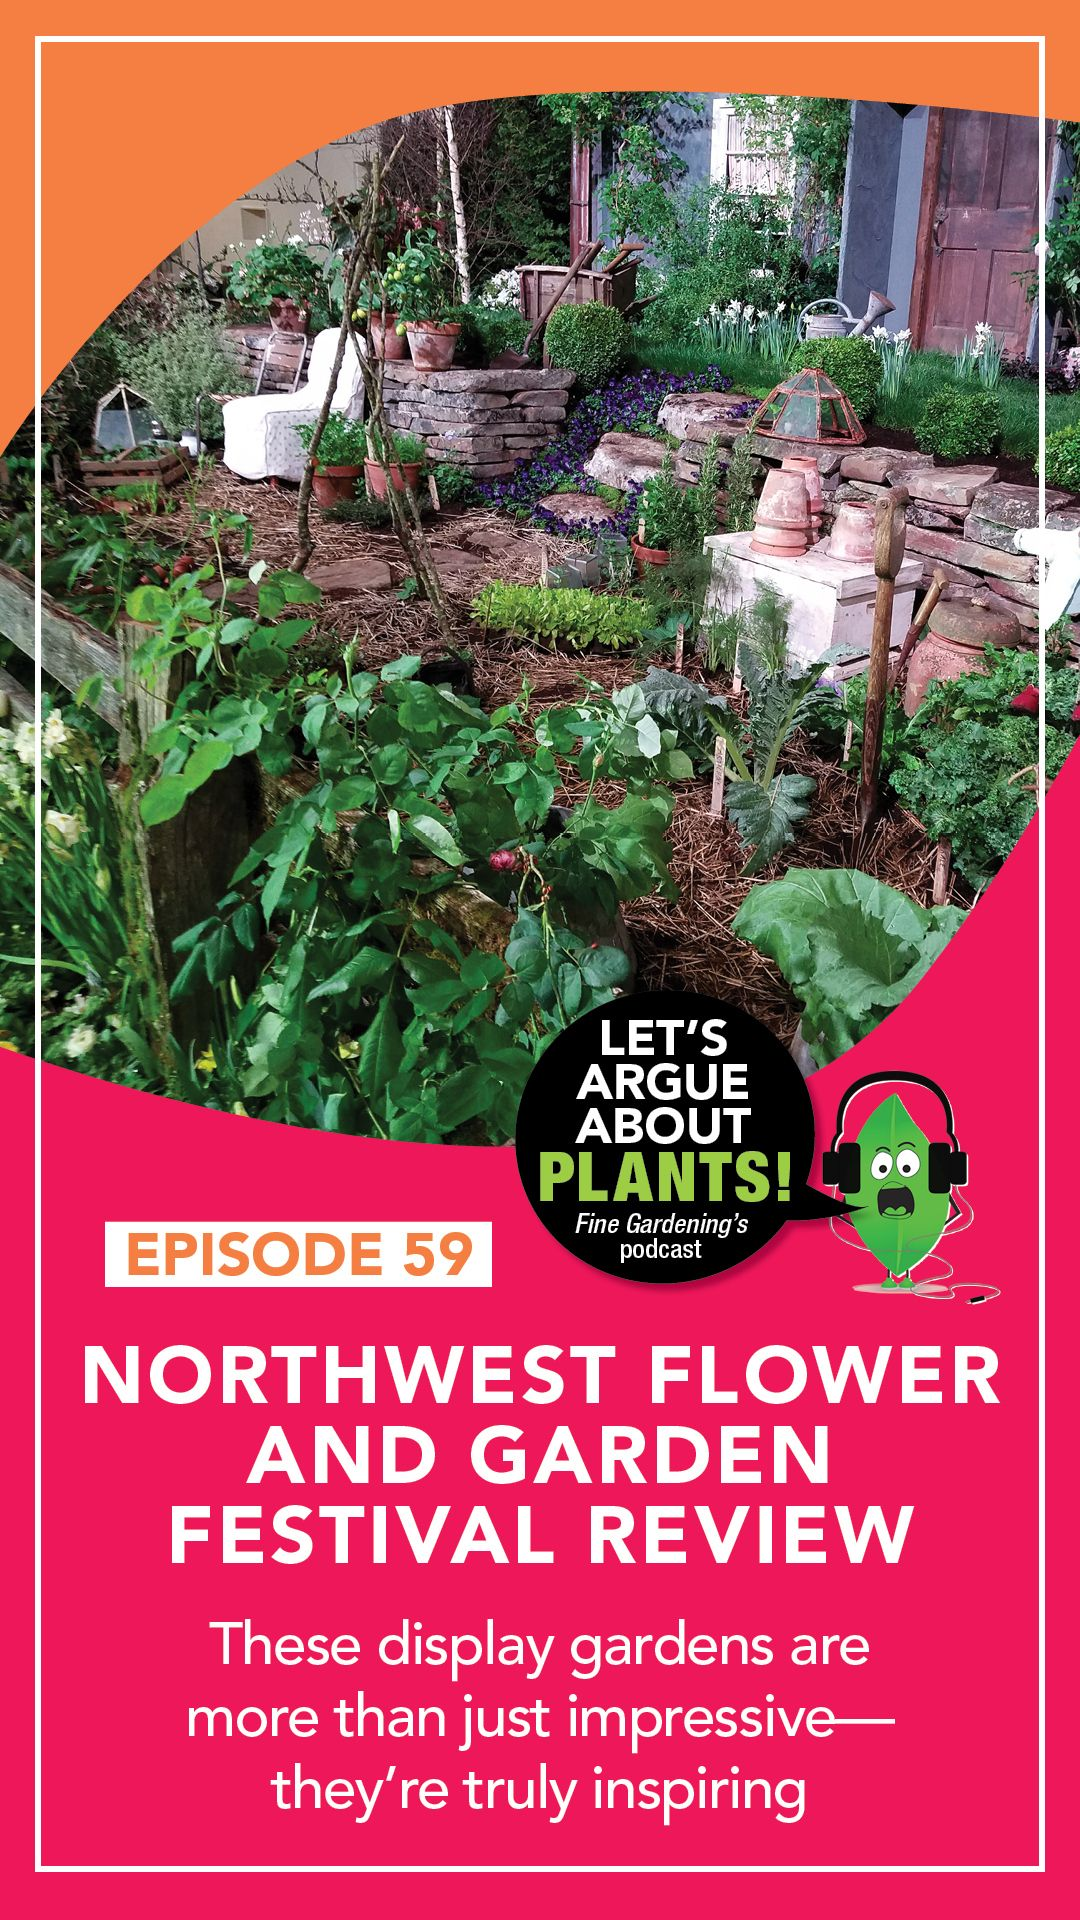 Episode 59: Northwest Flower and Garden Festival Review in ...